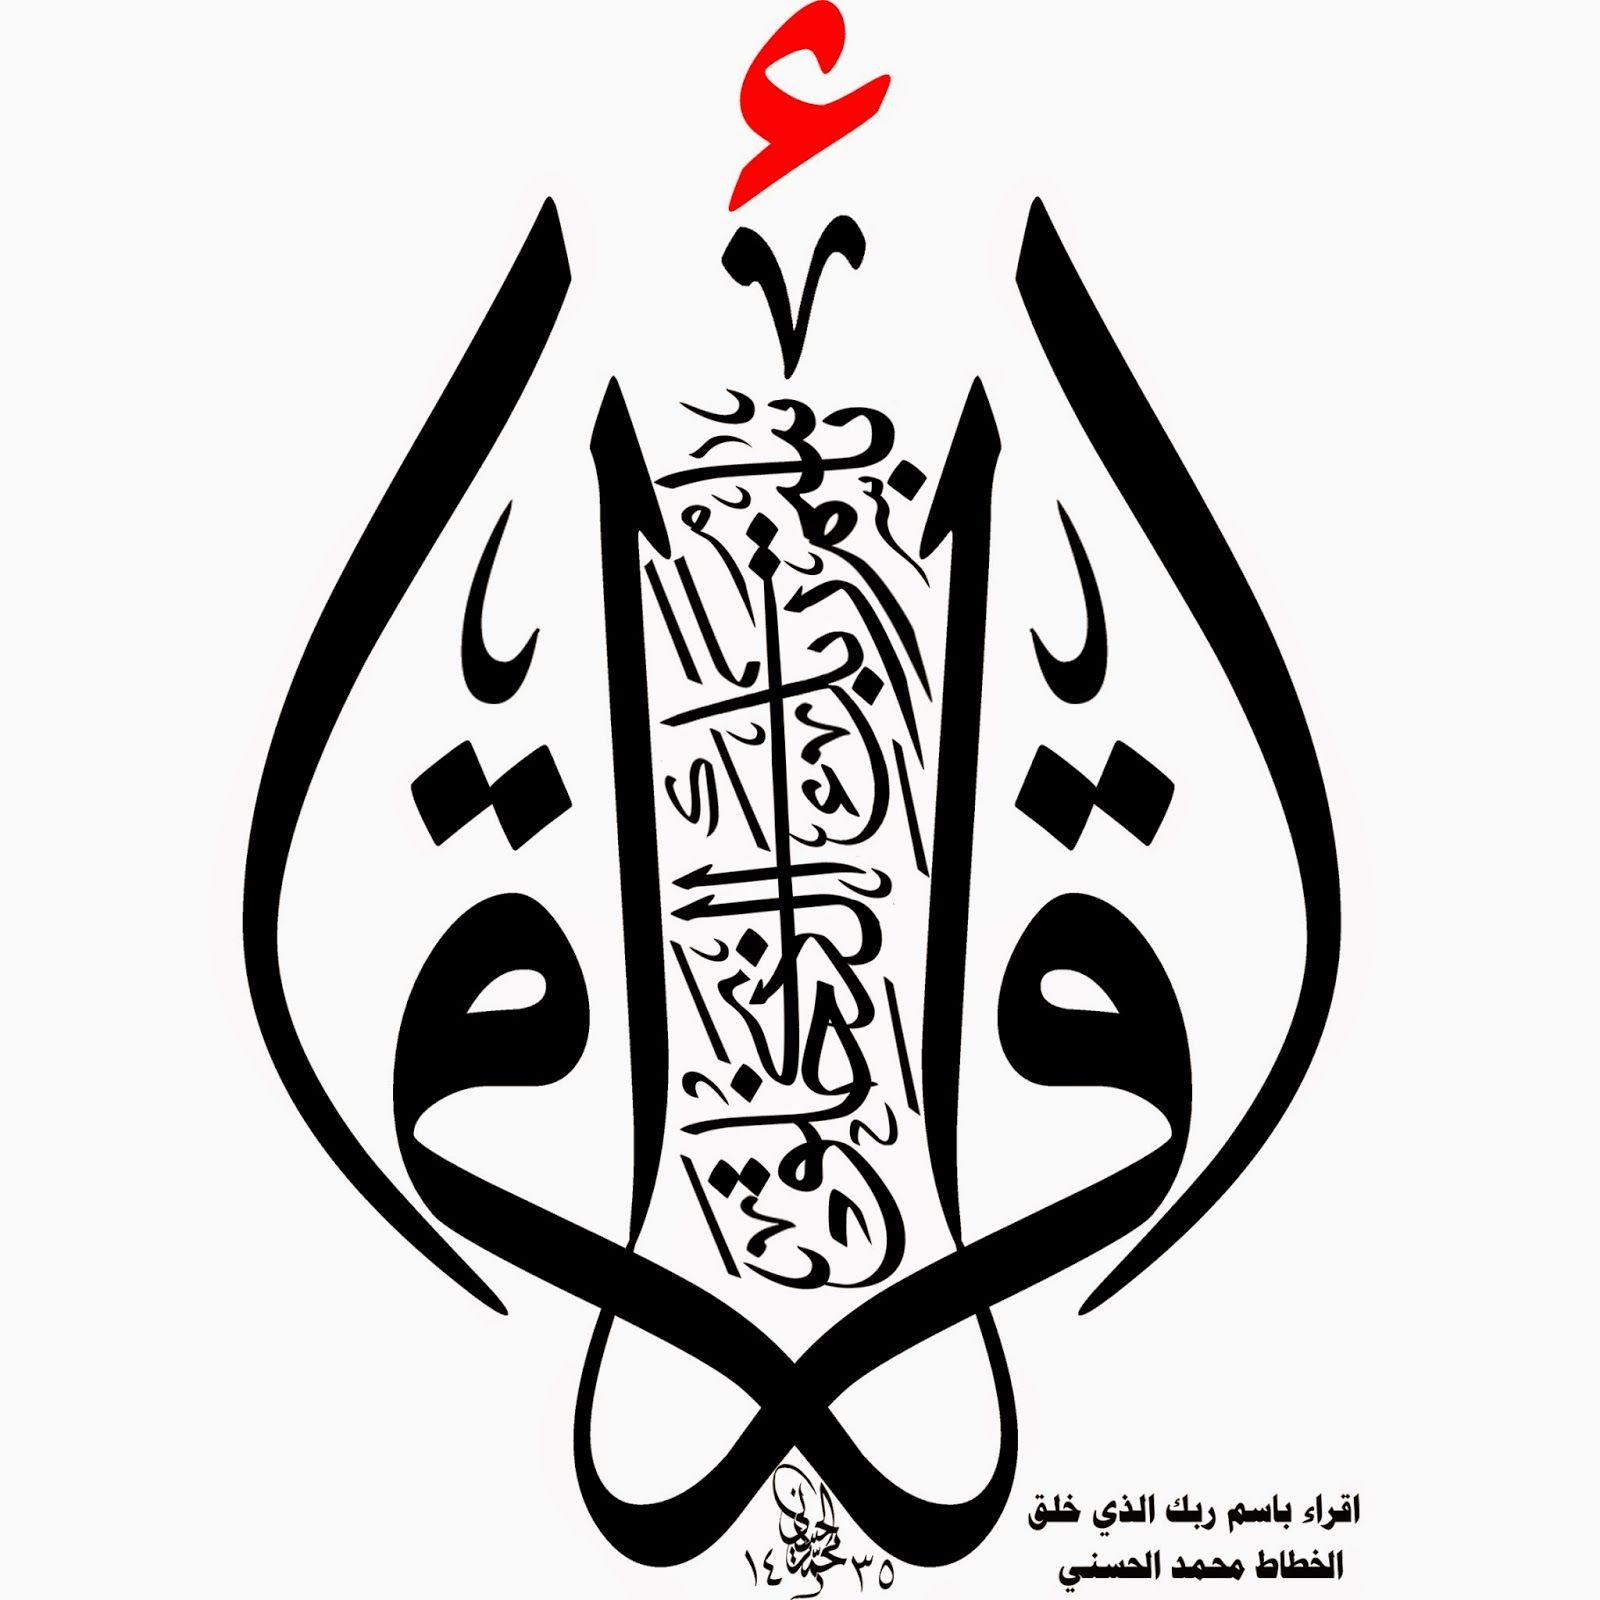 Desertrose Islamic Calligraphy Art Islamic Art Calligraphy Calligraphy Painting Islamic Art